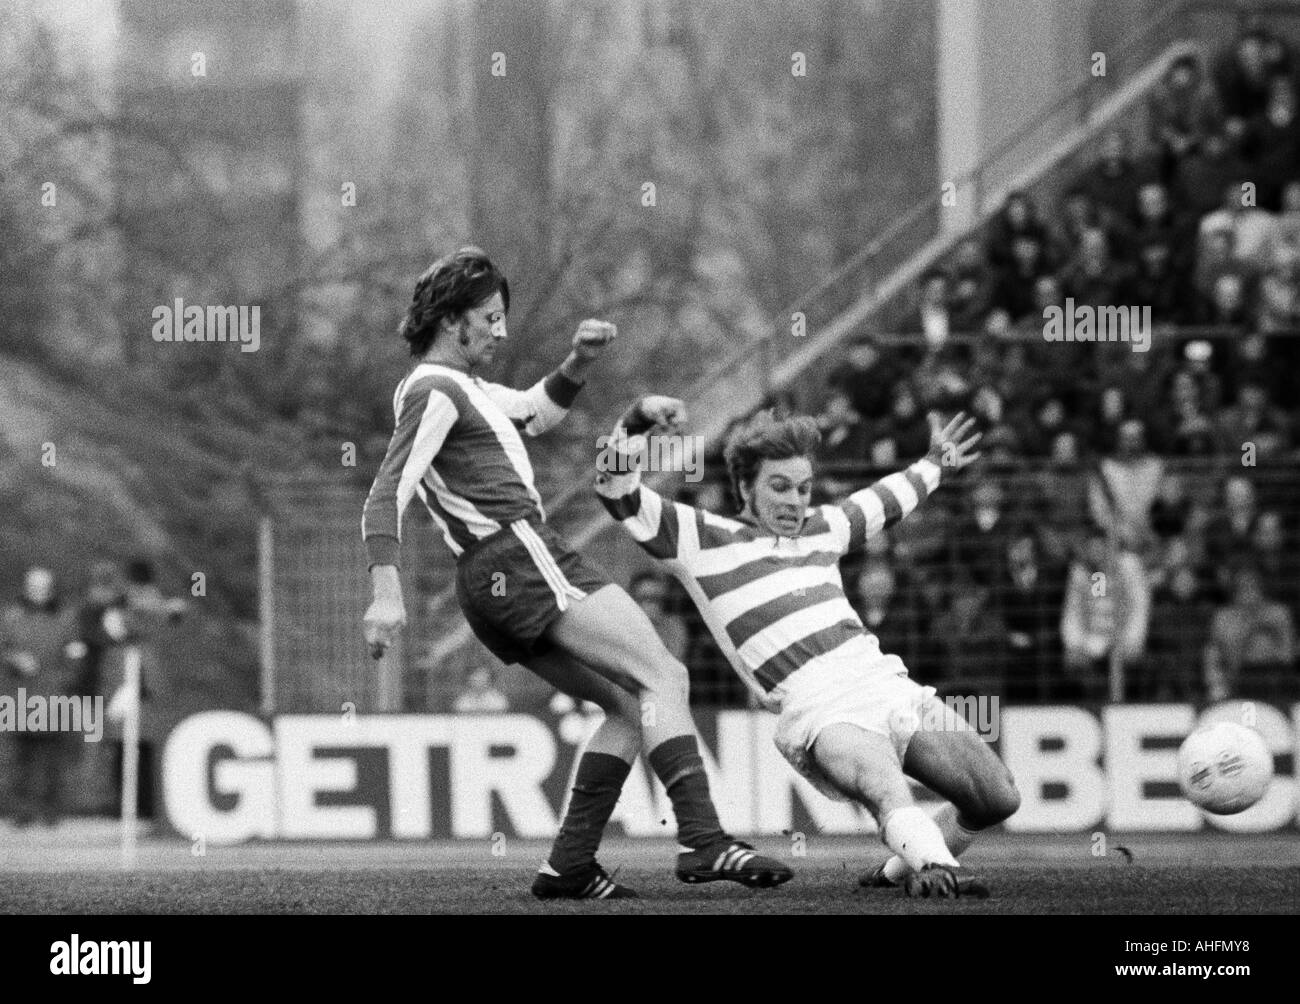 football, Bundesliga, 1971/1972, Wedau Stadium in Duisburg, MSV Duisburg versus FC Bayern Munich 3:0, scene of the match, duel between Wilhelm Hoffmann (FCB) left and Bernard Dietz (MSV) - Stock Image